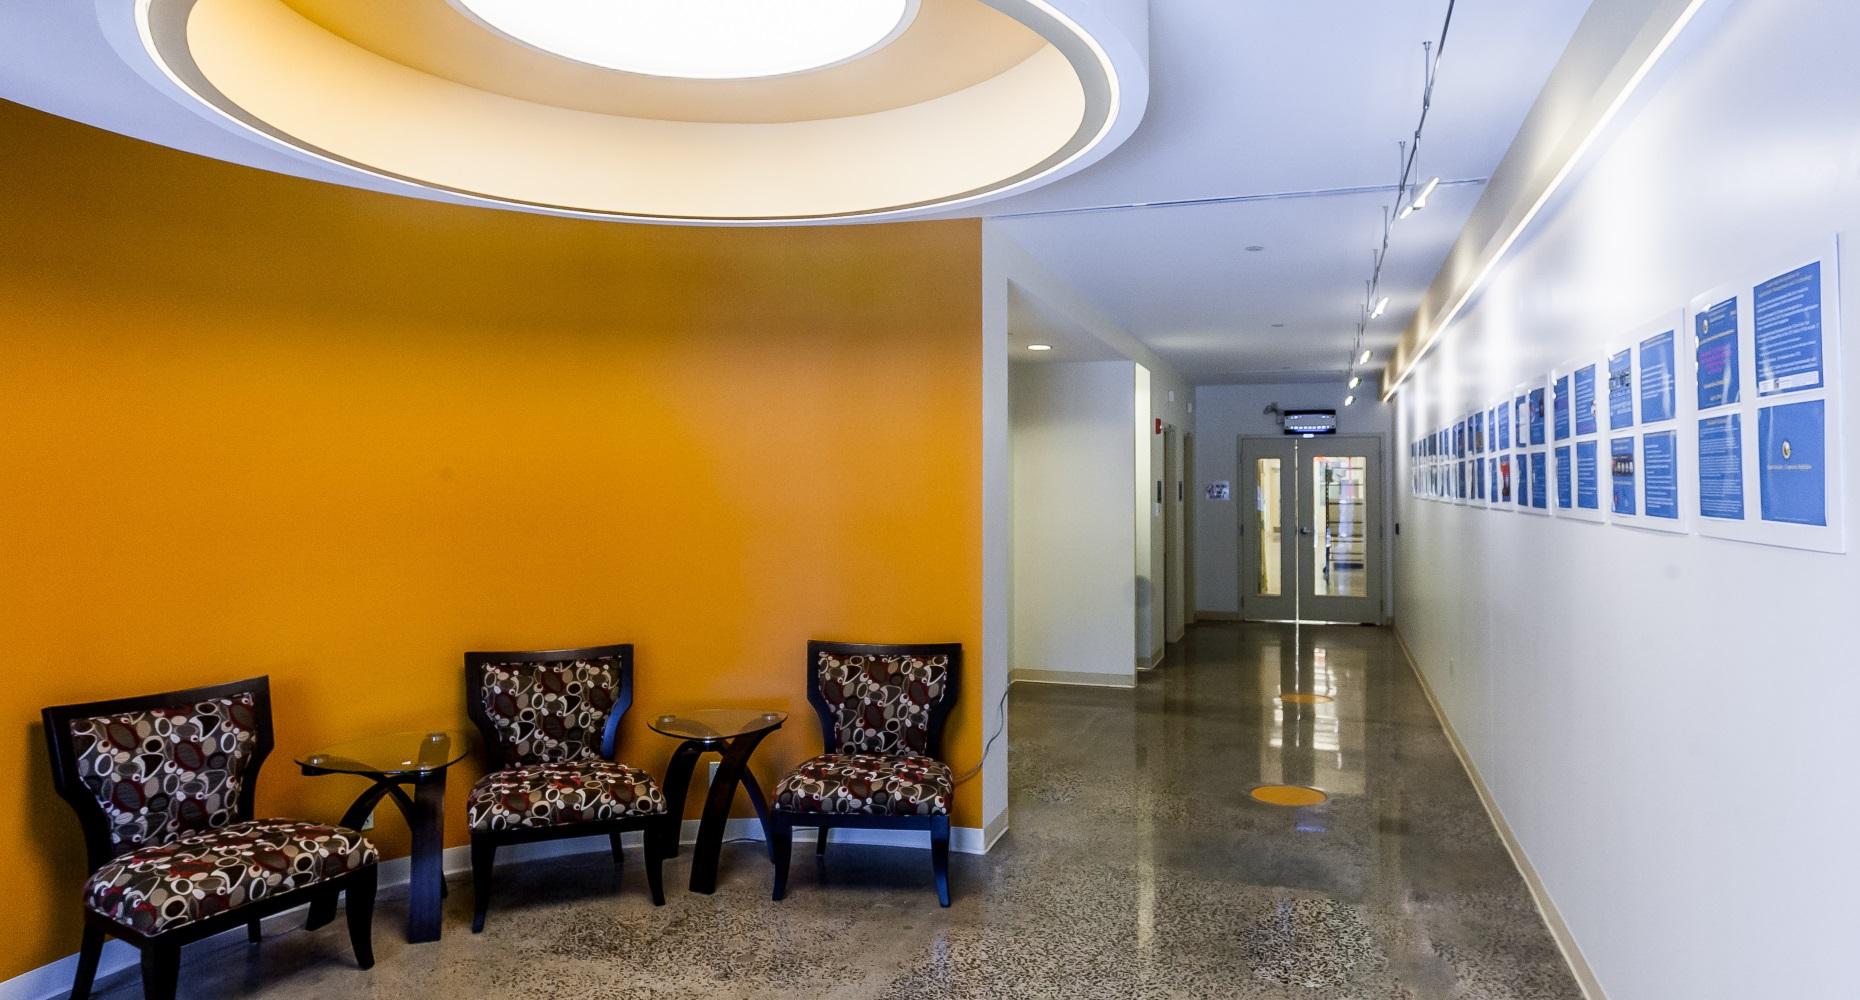 Heavy Tonnage Epoxy Floor : Polished concrete floors ct epoxy flooring heavy duty